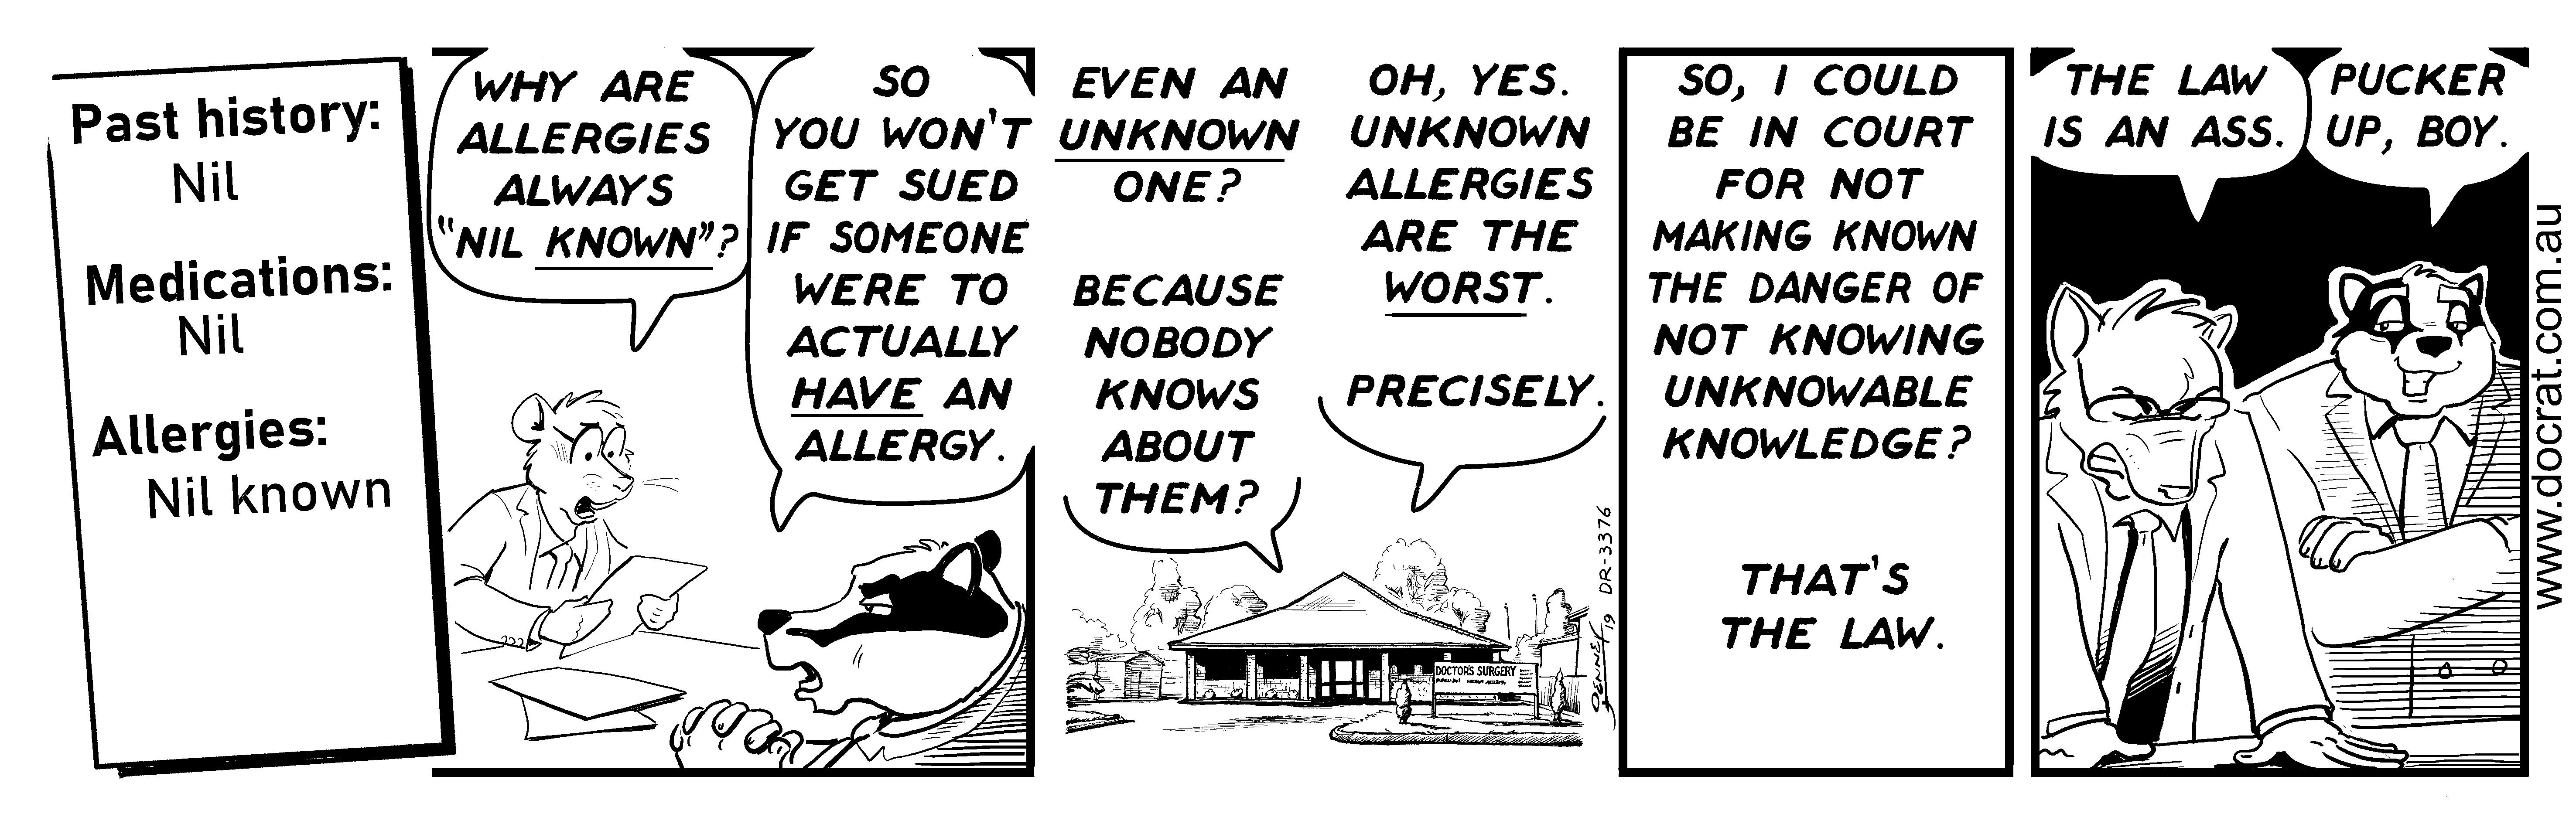 20191202